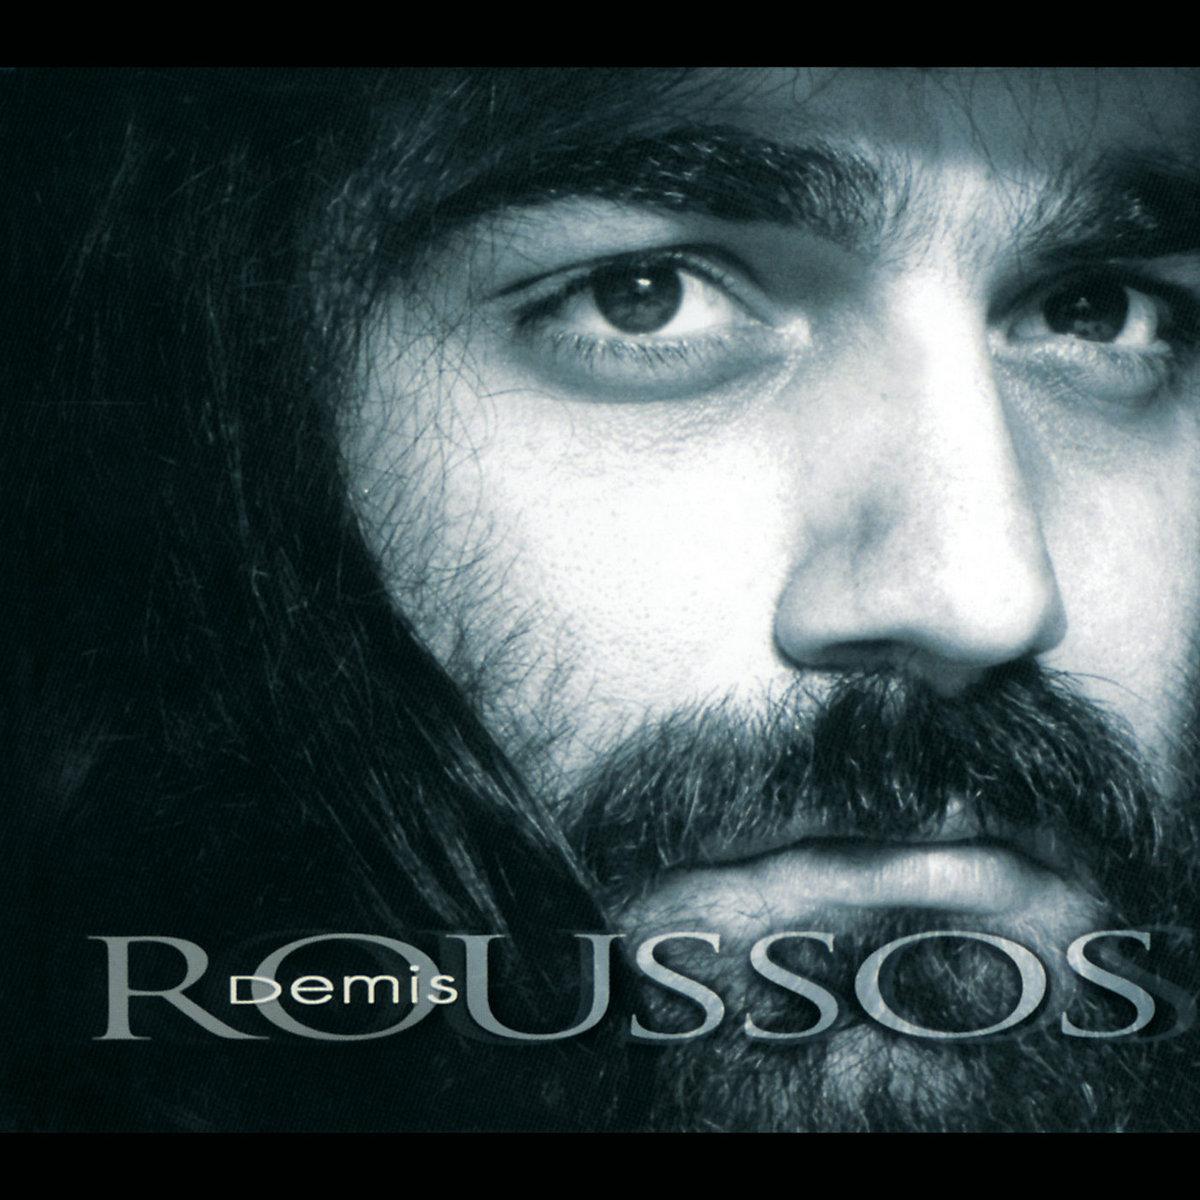 demis roussos albums mp3 free download